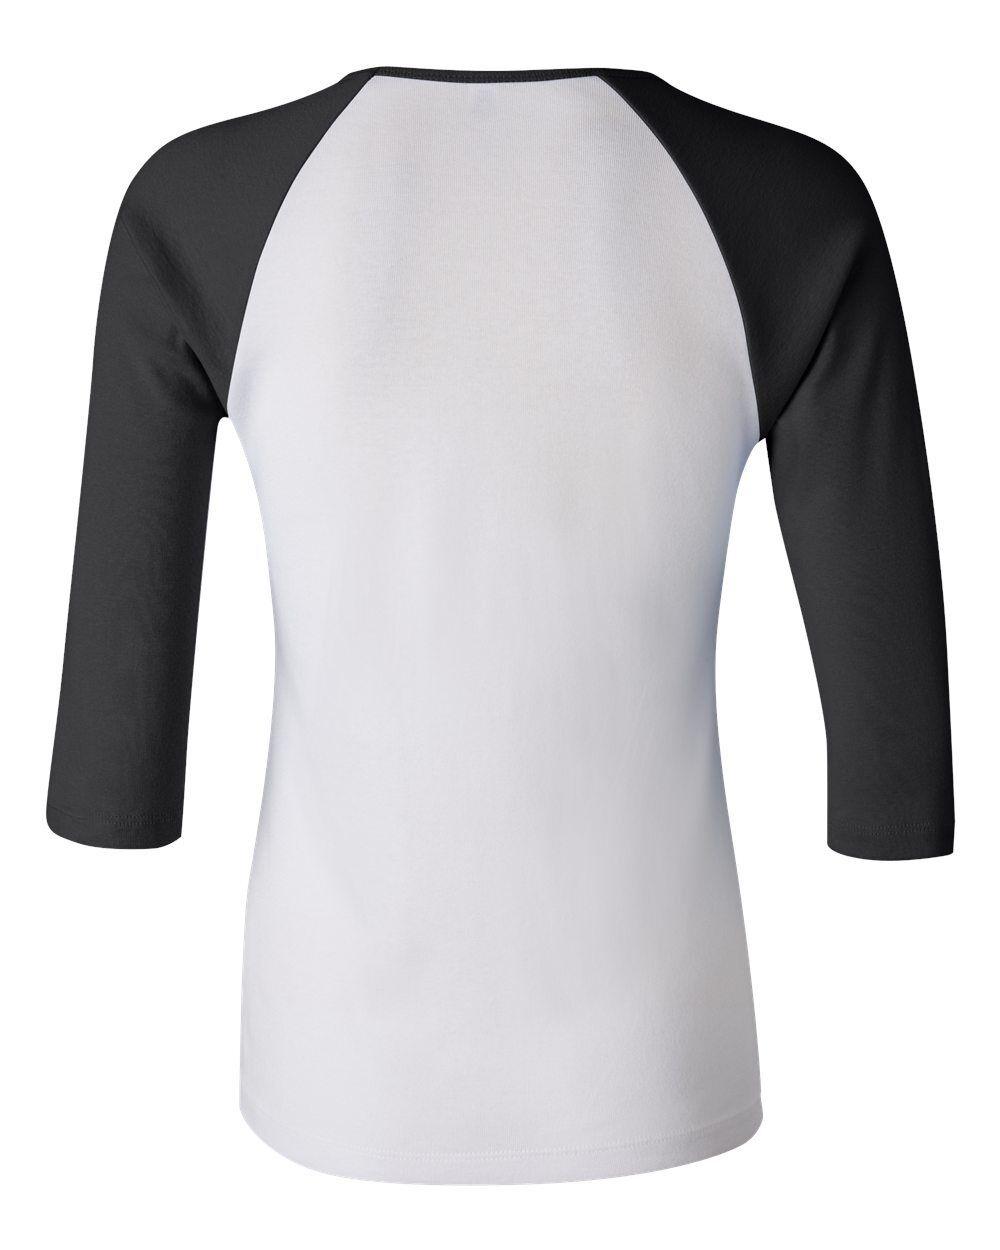 Bella 2000 Ladies Baseball Raglan 3/4 Sleeve T-Shirt Women TEE S M L XL 2XL SALE